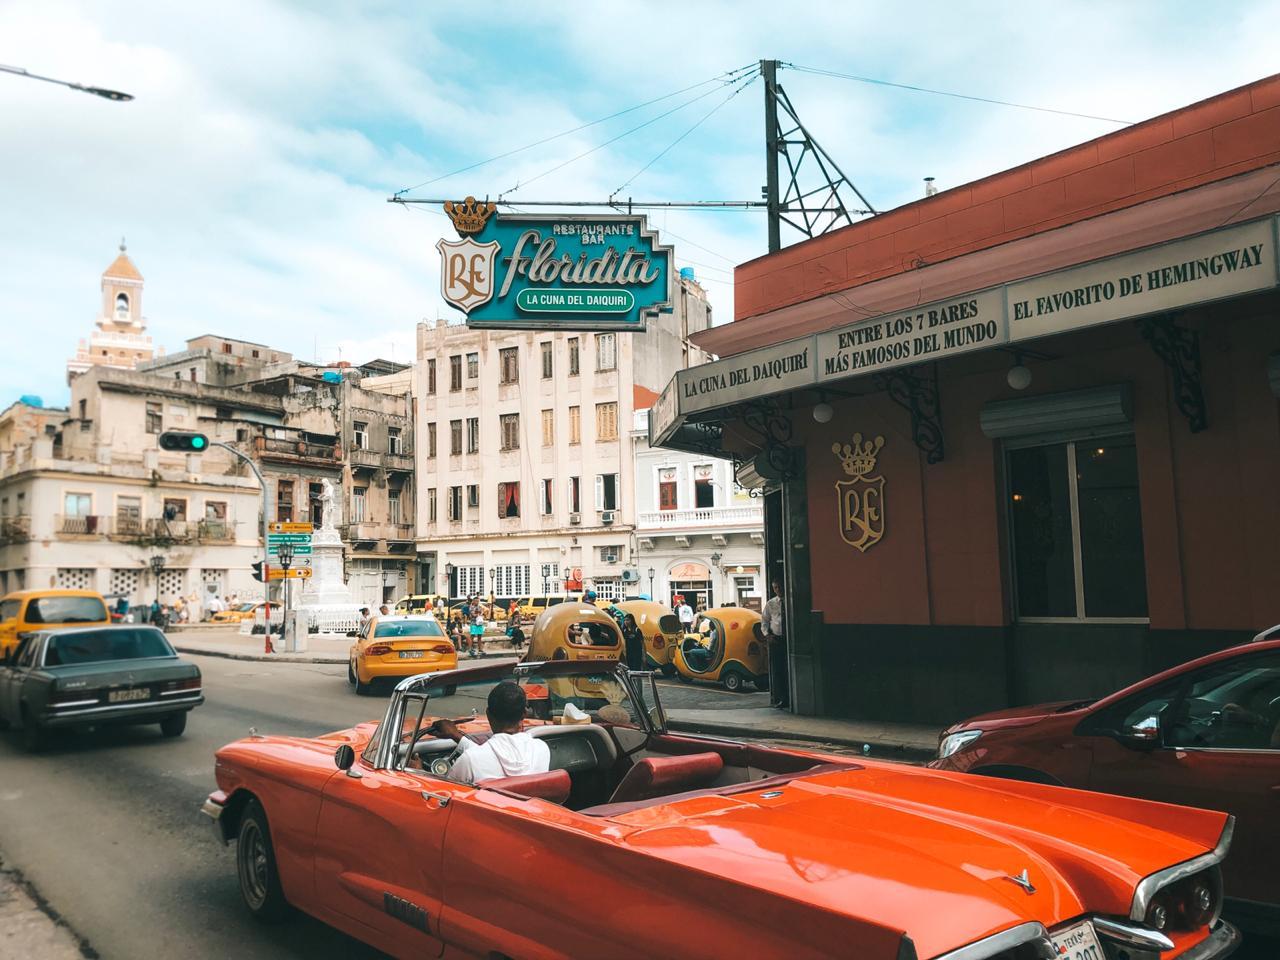 La Floridita, em Havana, Cuba (Foto: Tati Sisti)